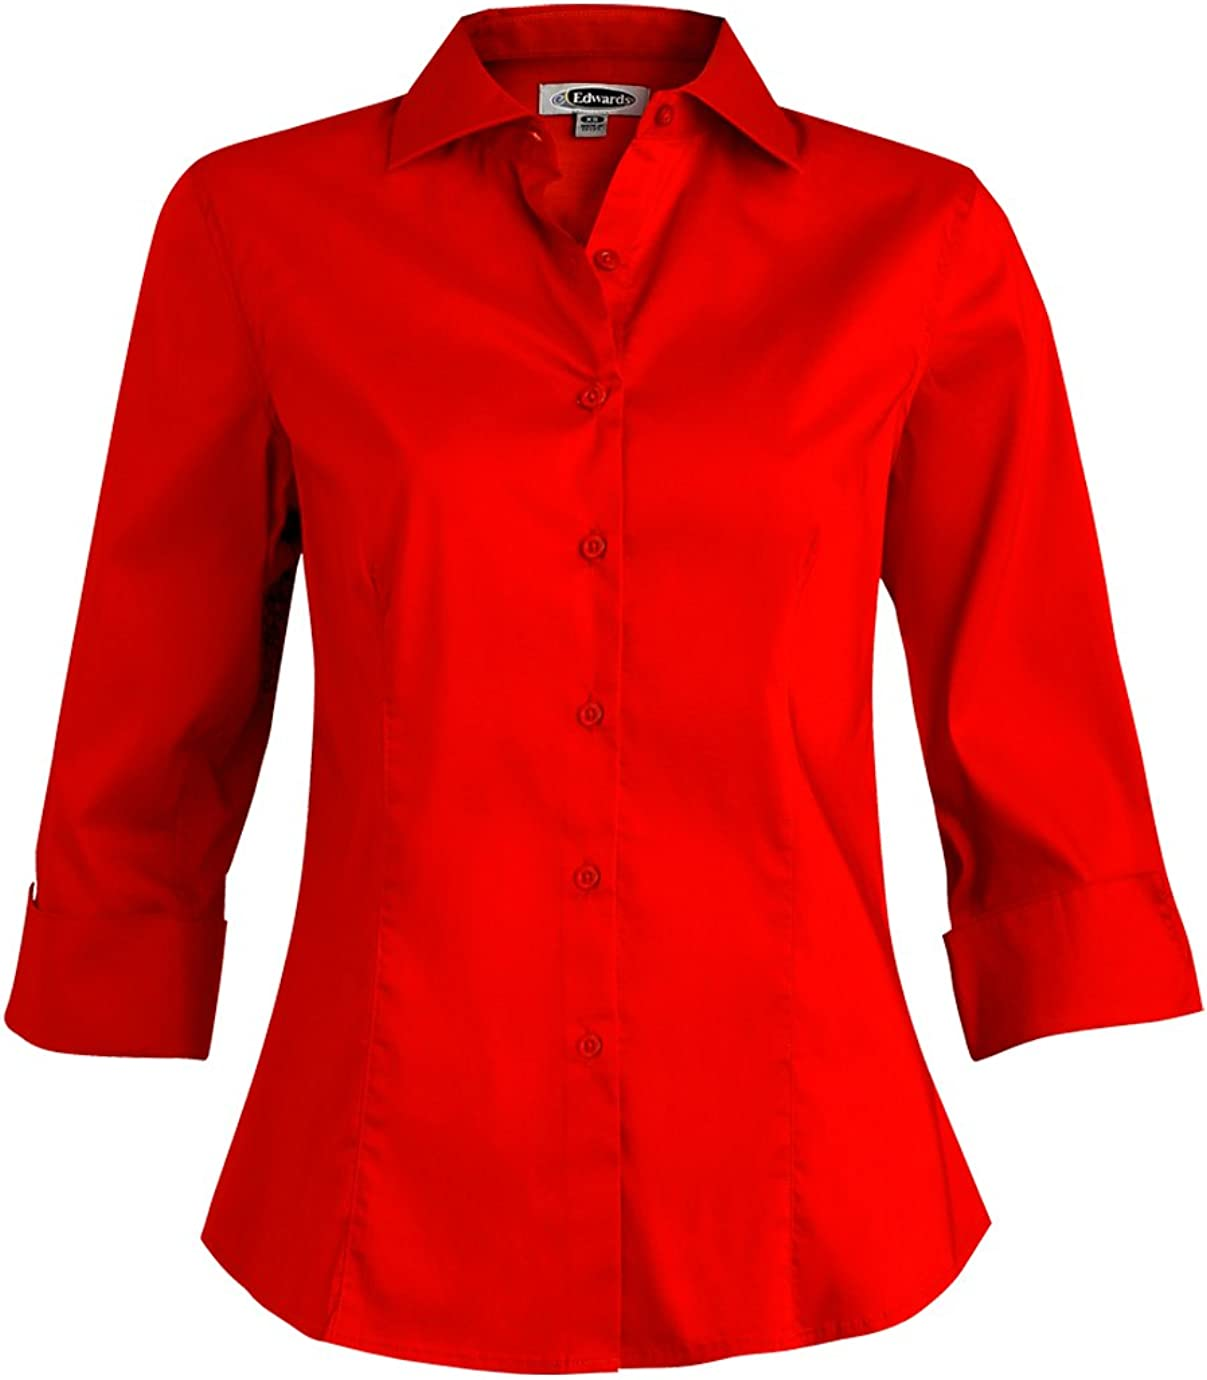 Edwards Garment Women's 3/4 Sleeve Wrinkle Resistant Stretch Cuff Blouse